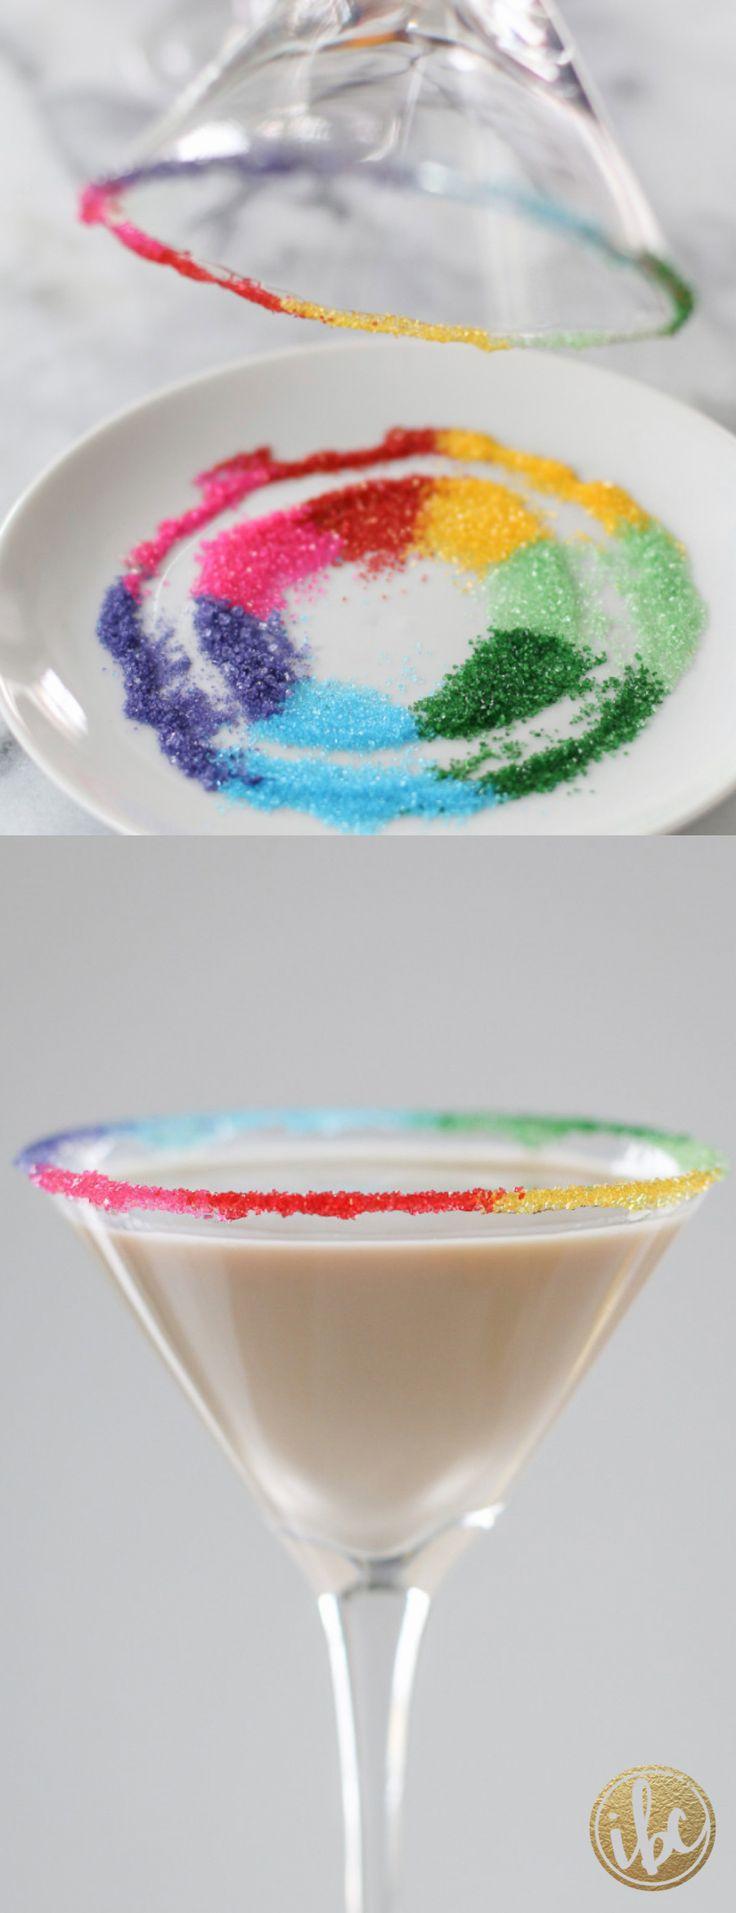 Leprechaun's Kiss Martini - St. Patrick's Day cocktail recipe with rainbow sugar rim.